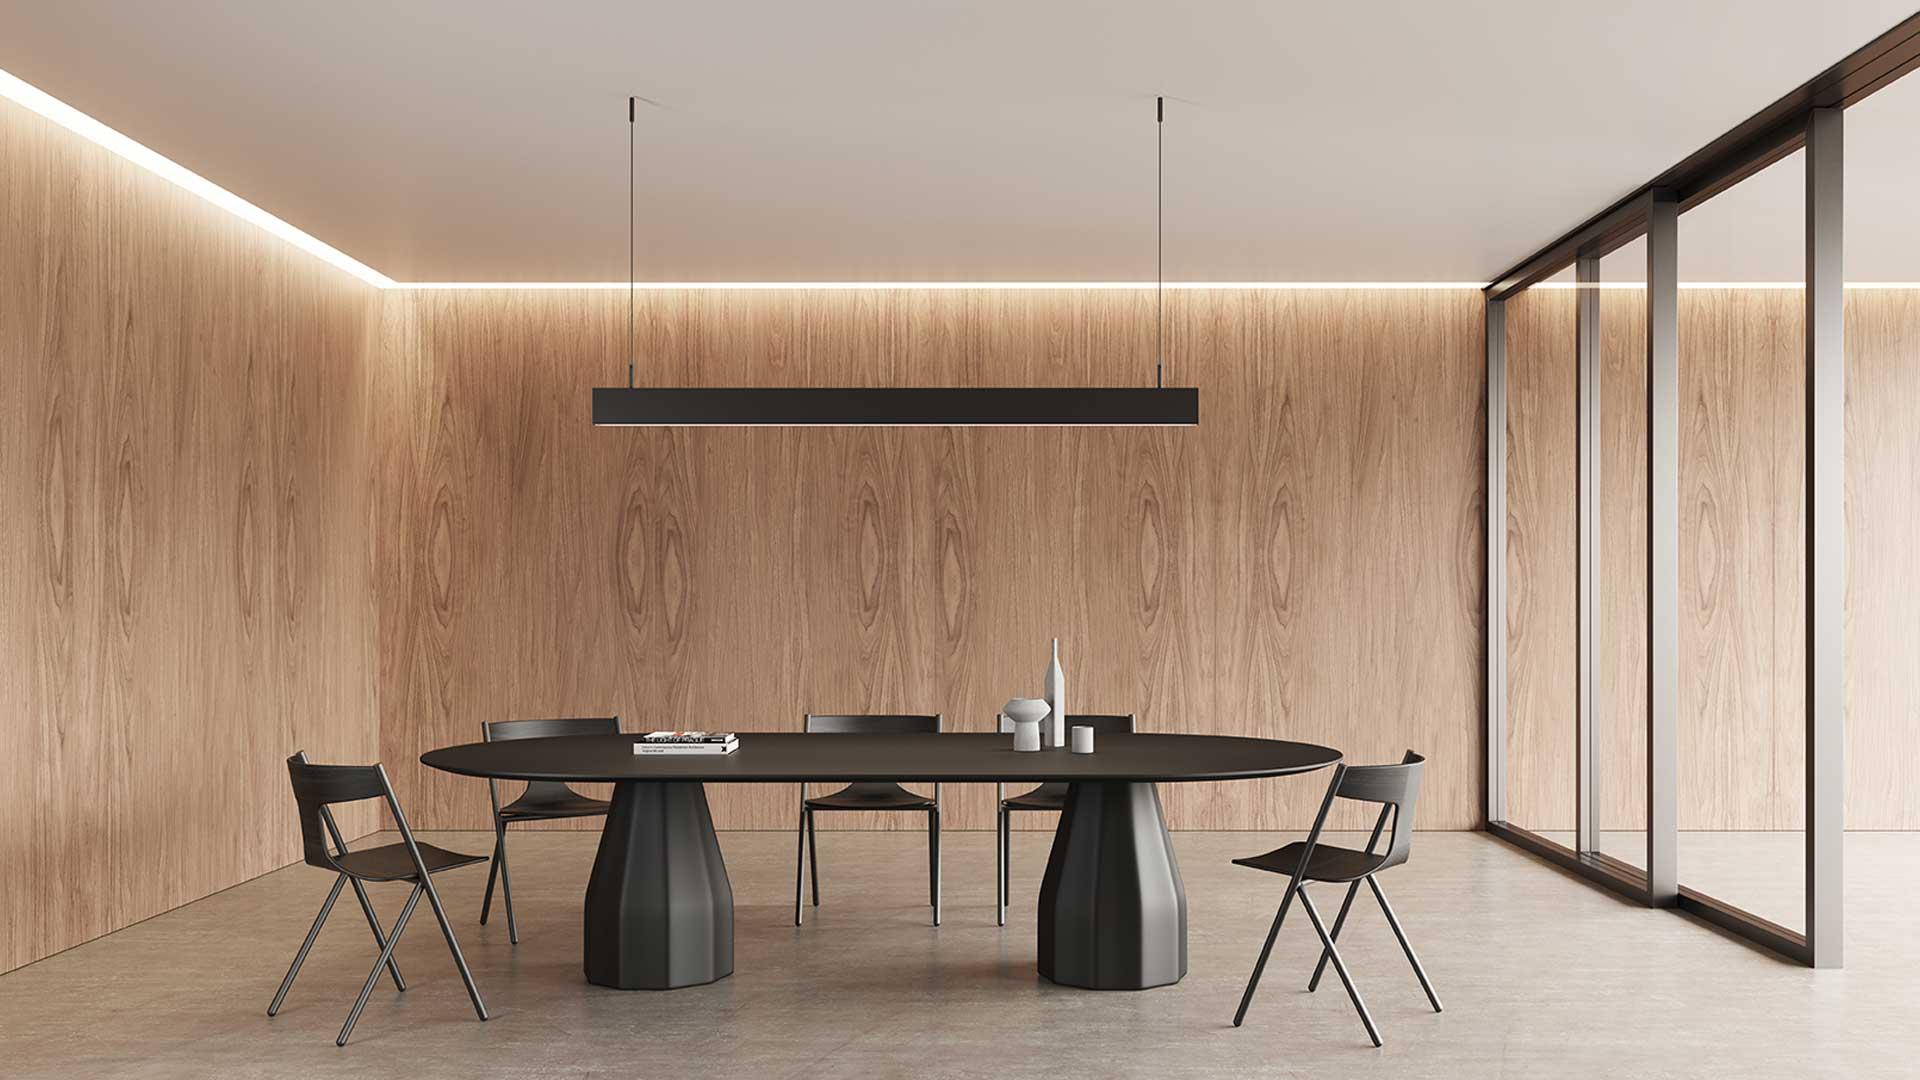 Viccarbe Contemporary Furniture For Callaborative Spaces